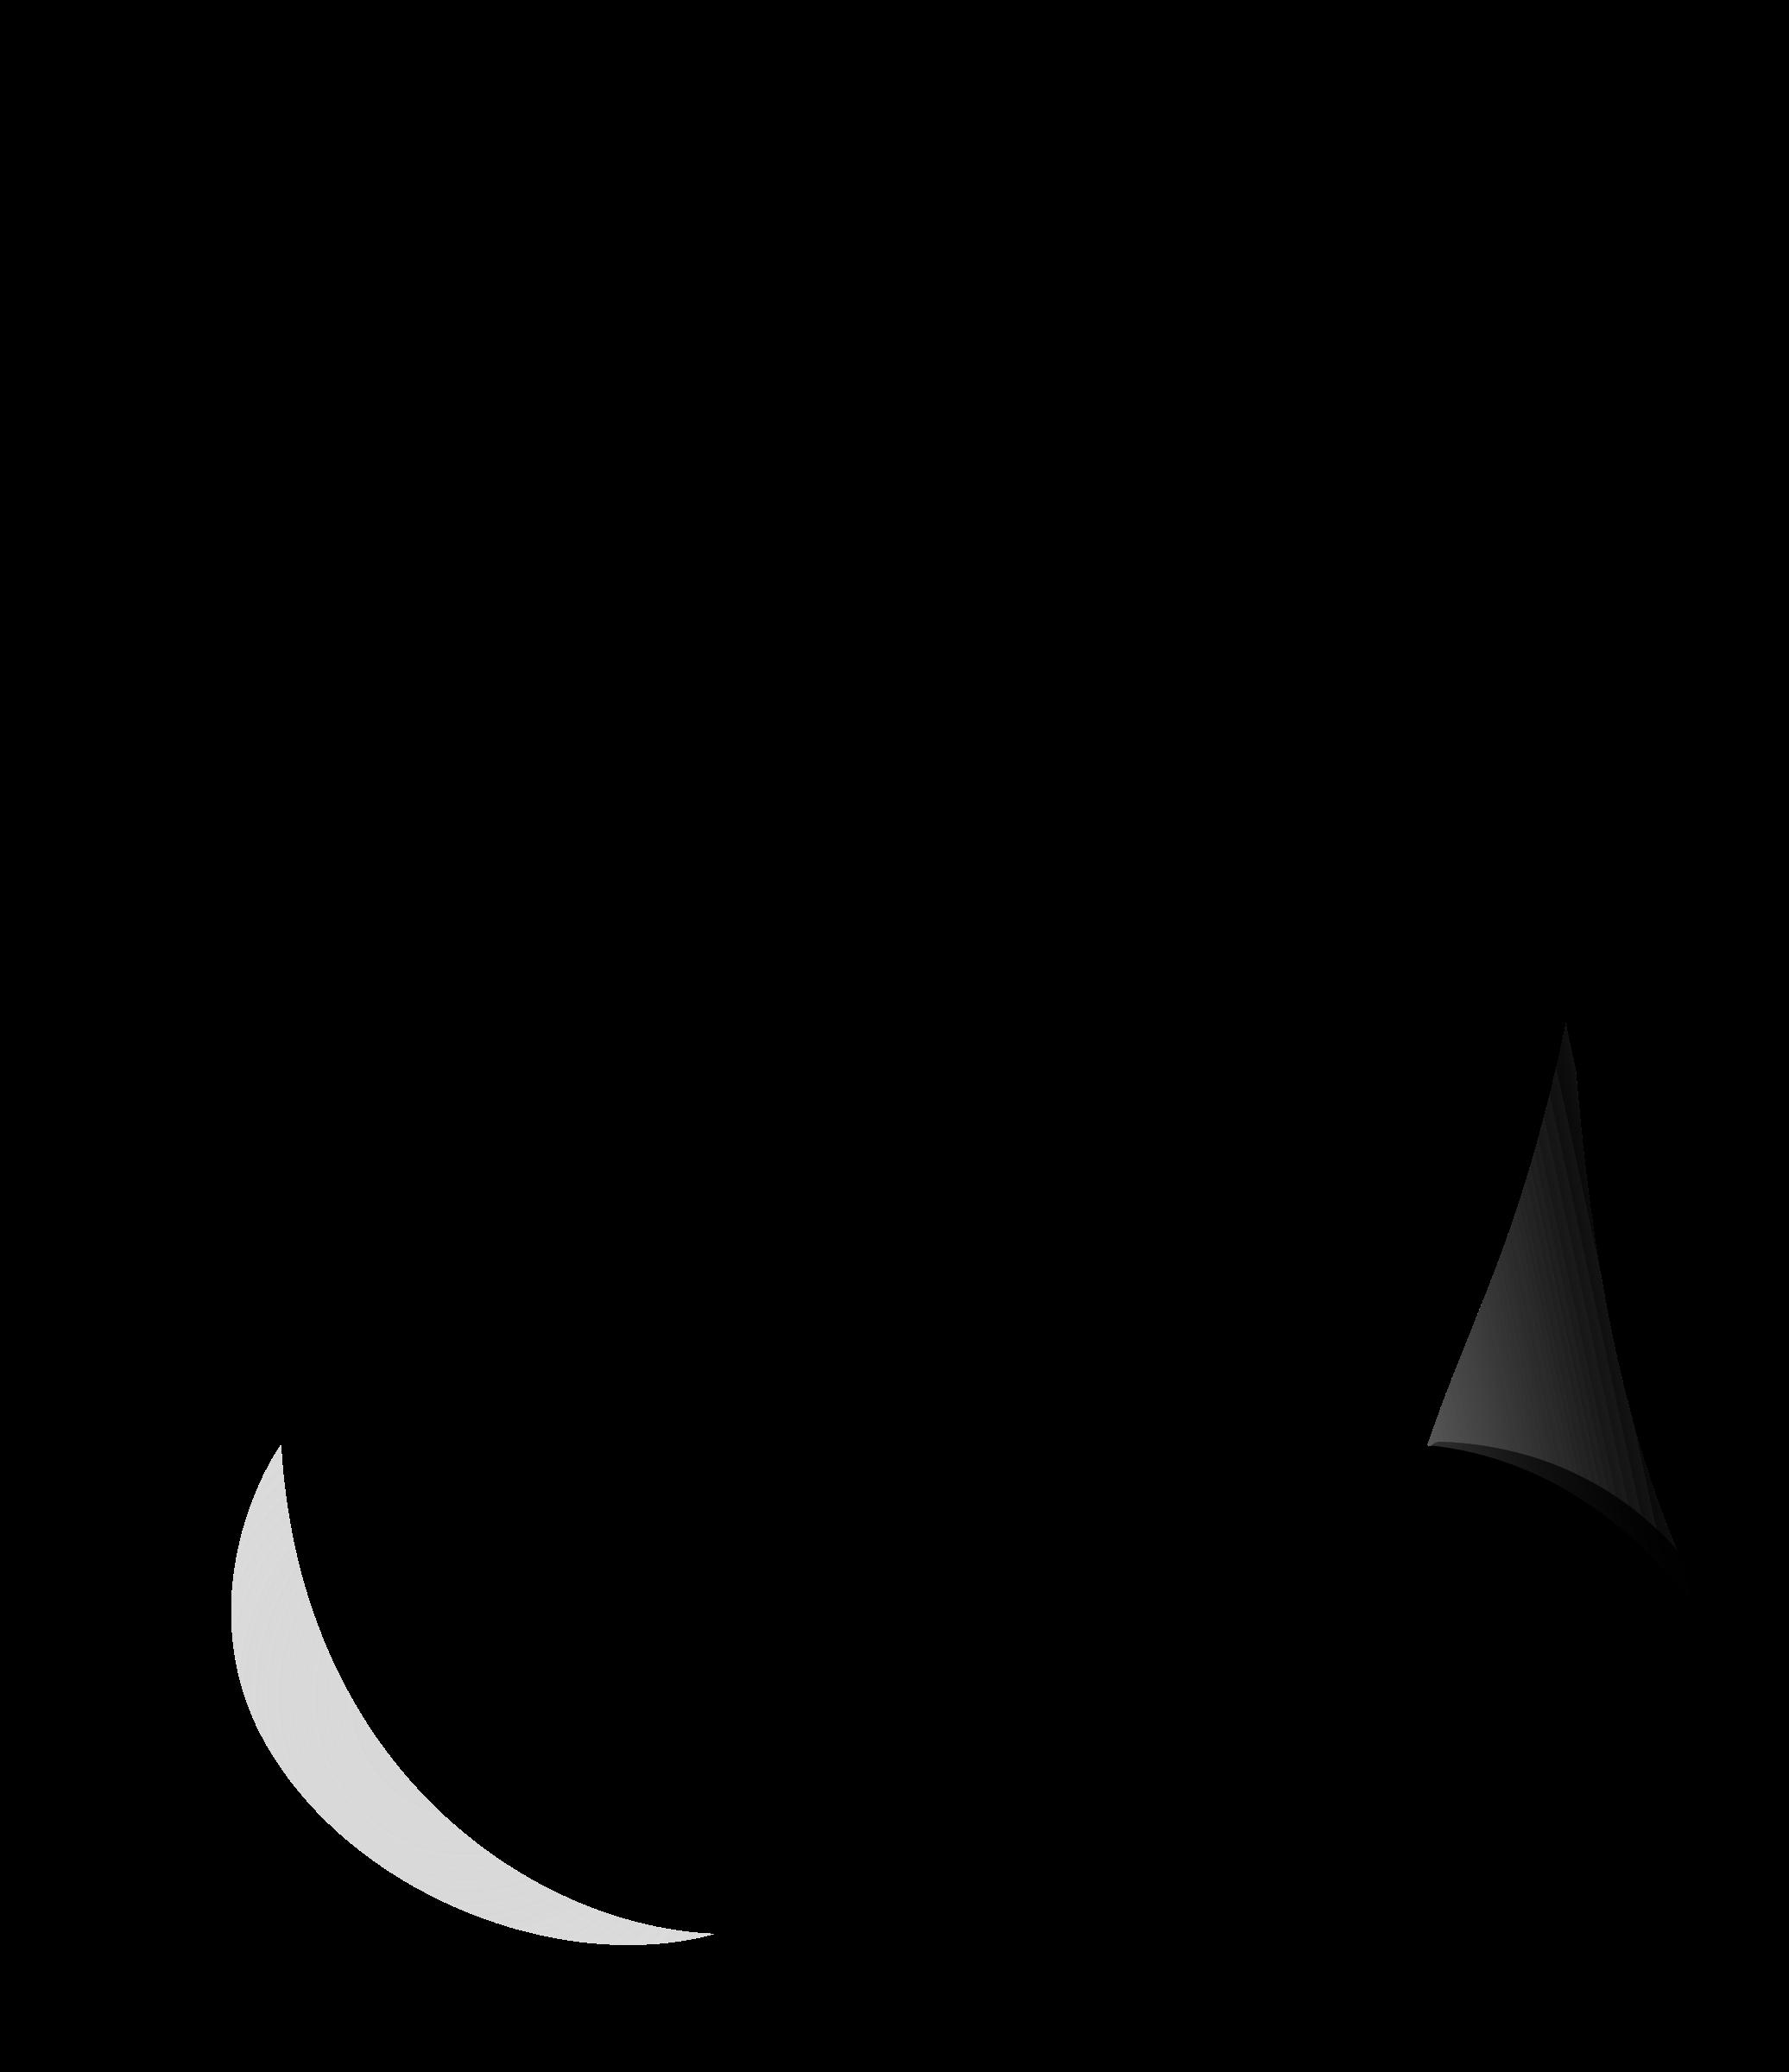 Nose Clip Art Black And White.